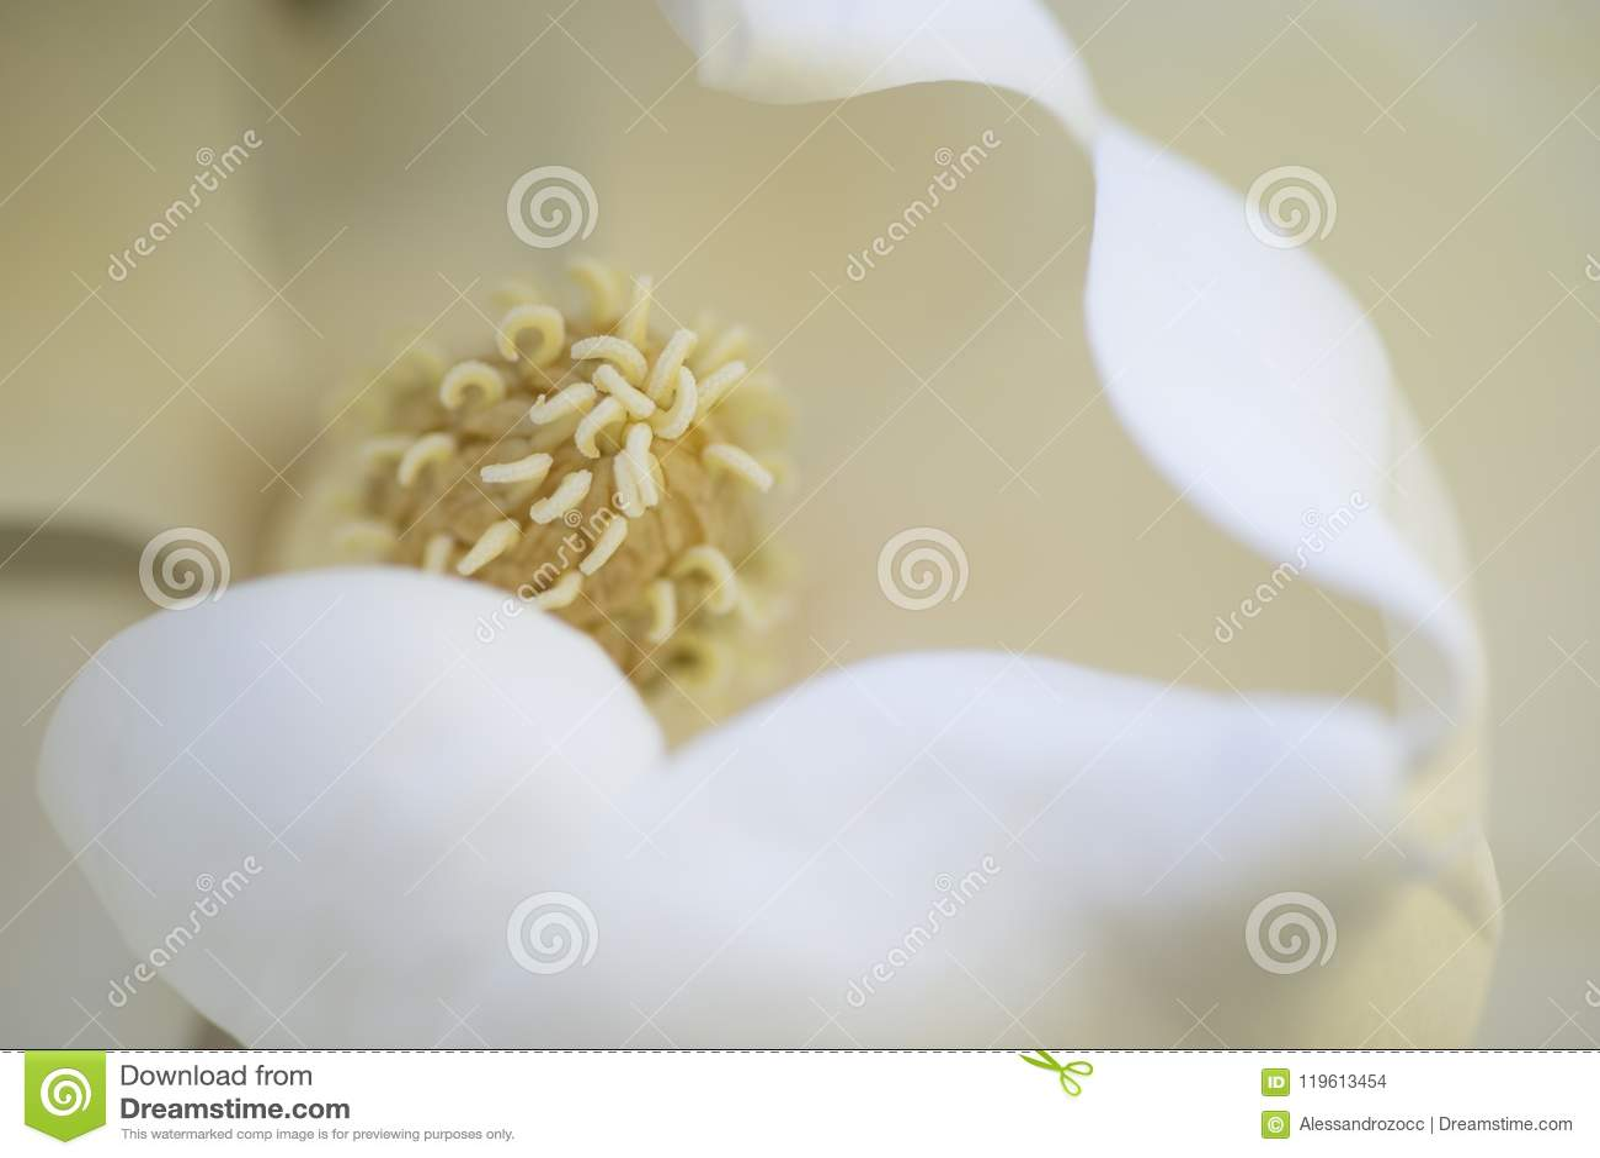 Detalle de la flor de la magnolia meridional